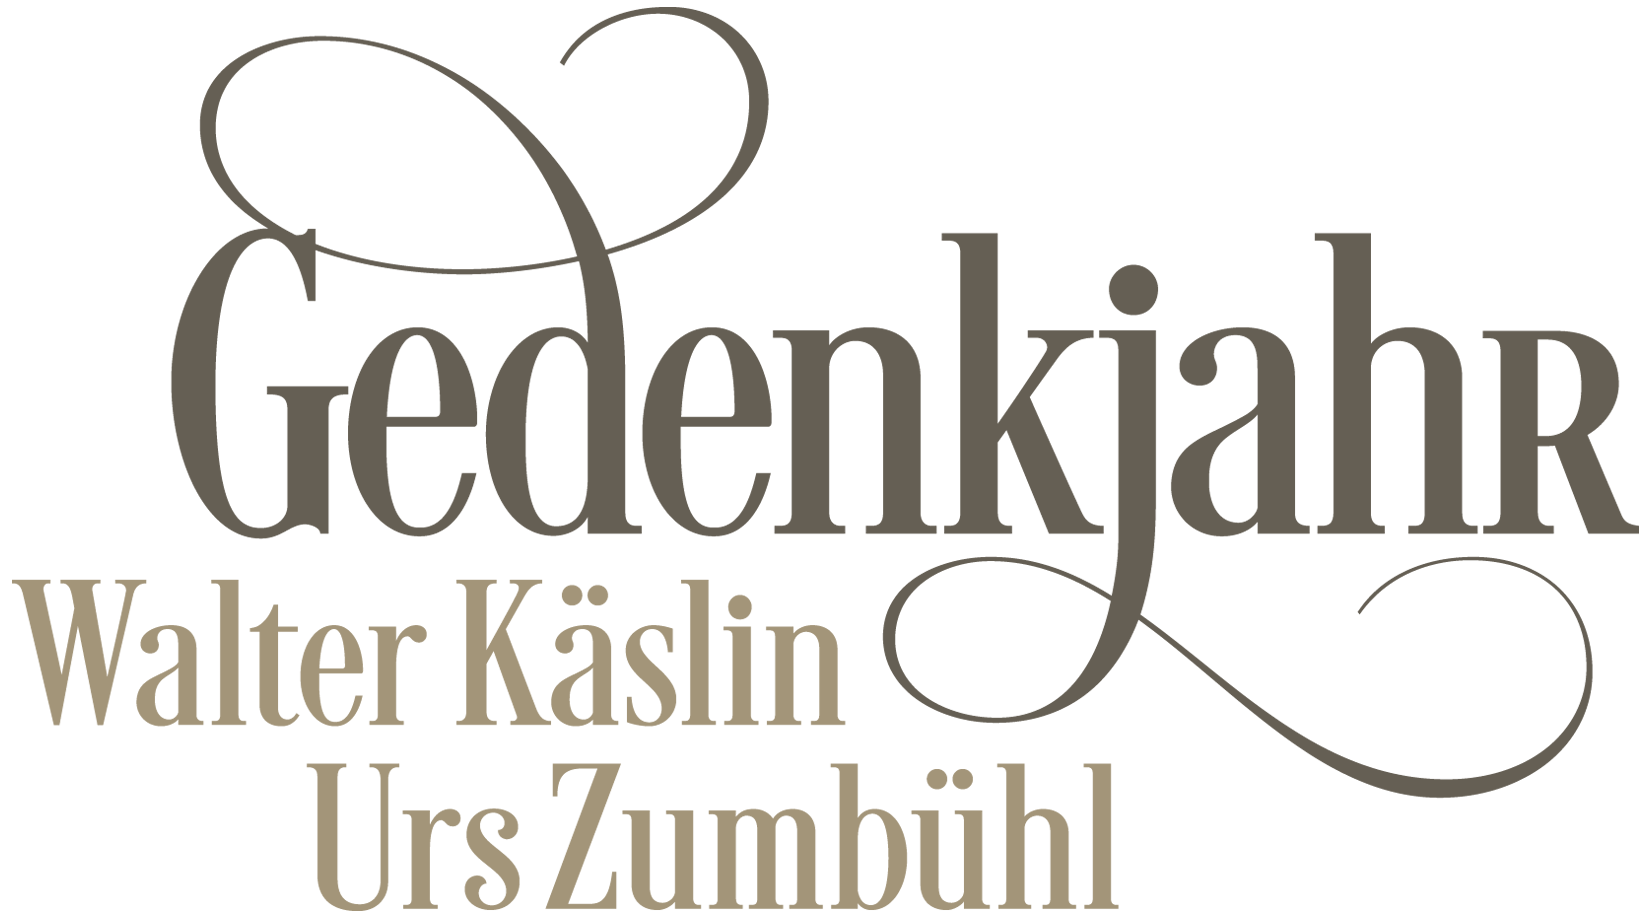 logo_kaeslin_zumbuehl_4f.png